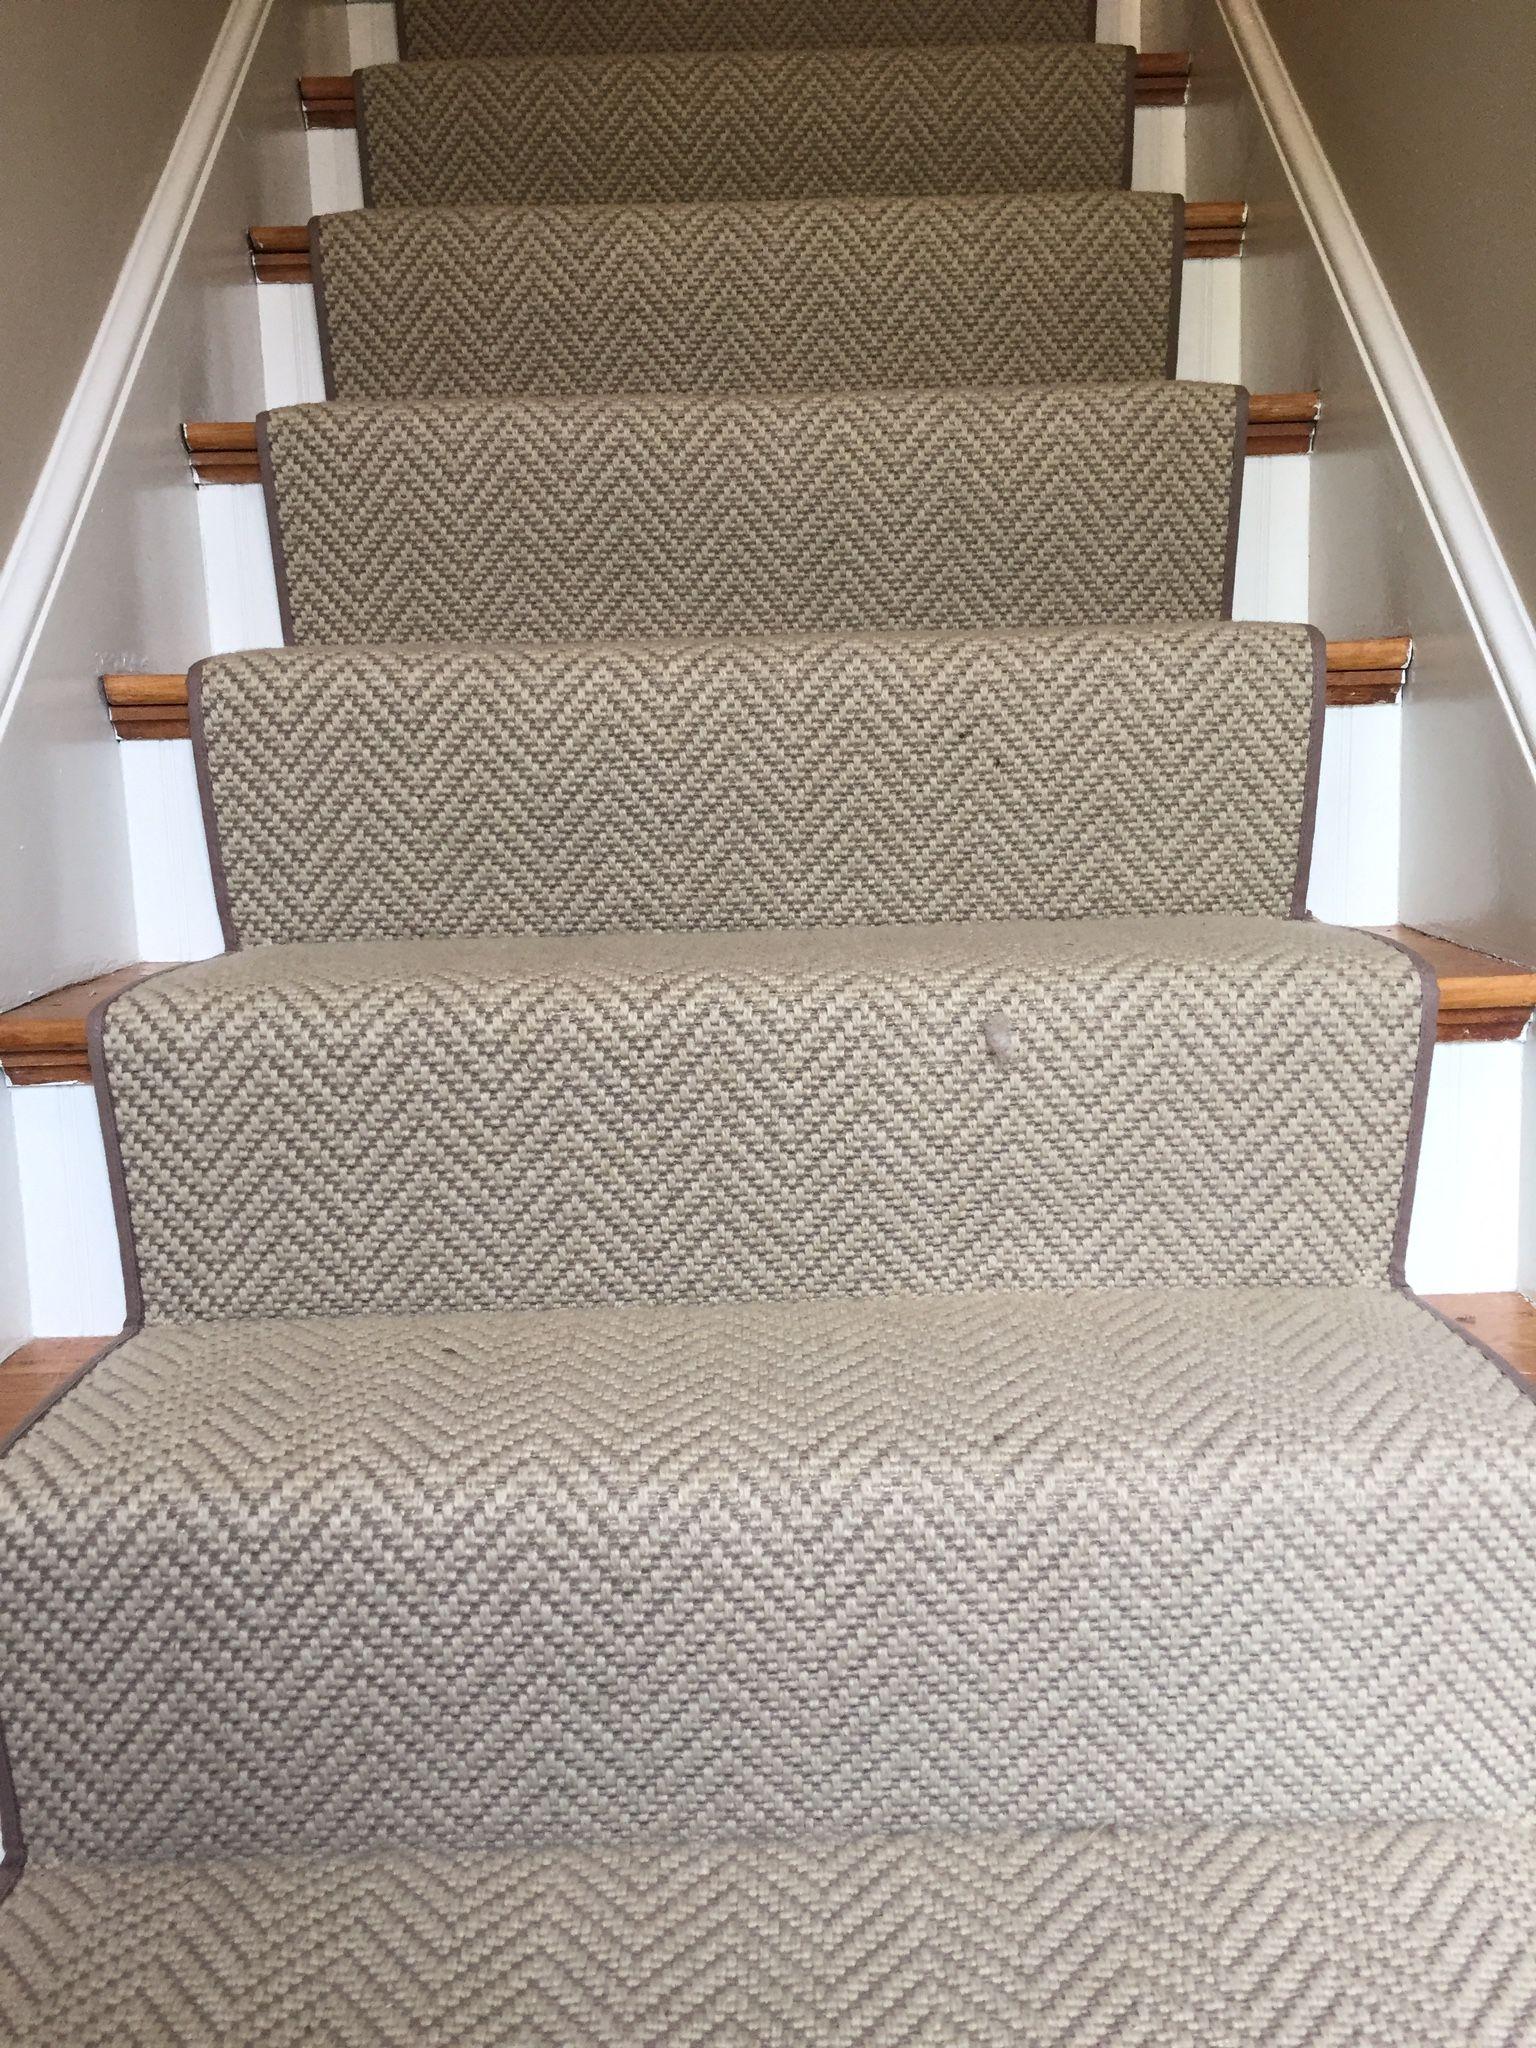 Herringbone Sisal Look Carpet   Lets See Carpet new Design